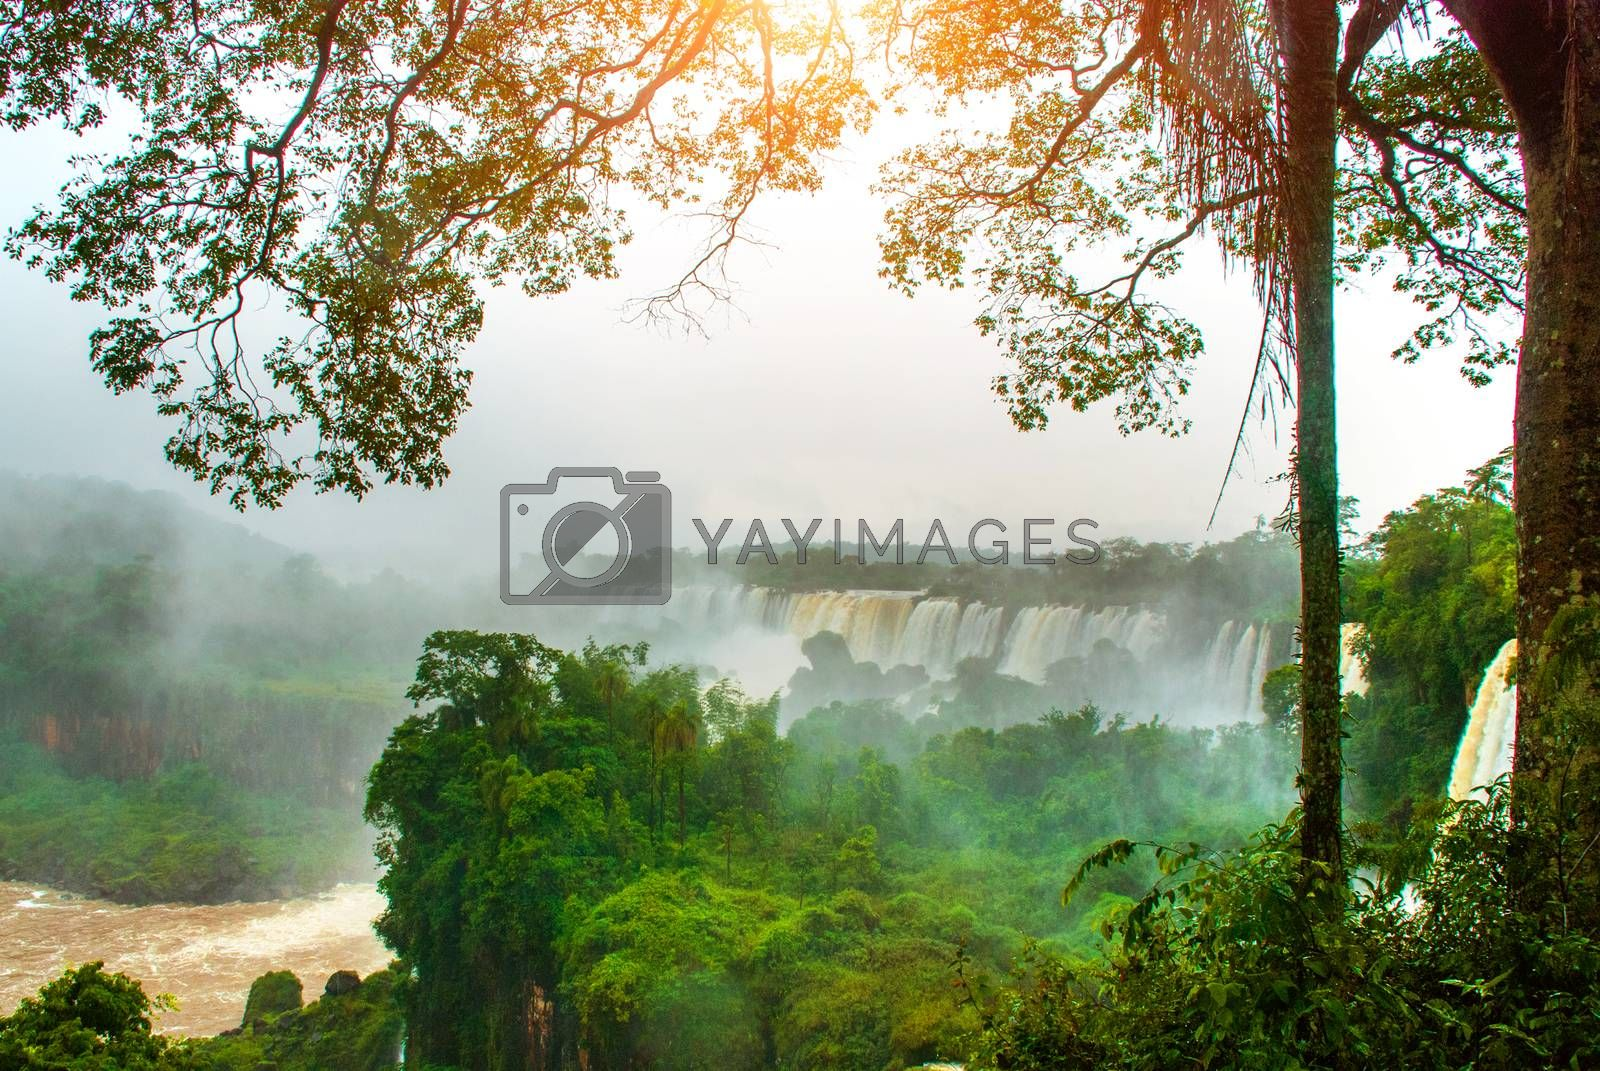 Argentina, America, Waterfalls, Iguazu Falls: Beautiful landscape overlooking the world famous waterfall, the seventh wonder of the world. UNESCO World Heritage site.